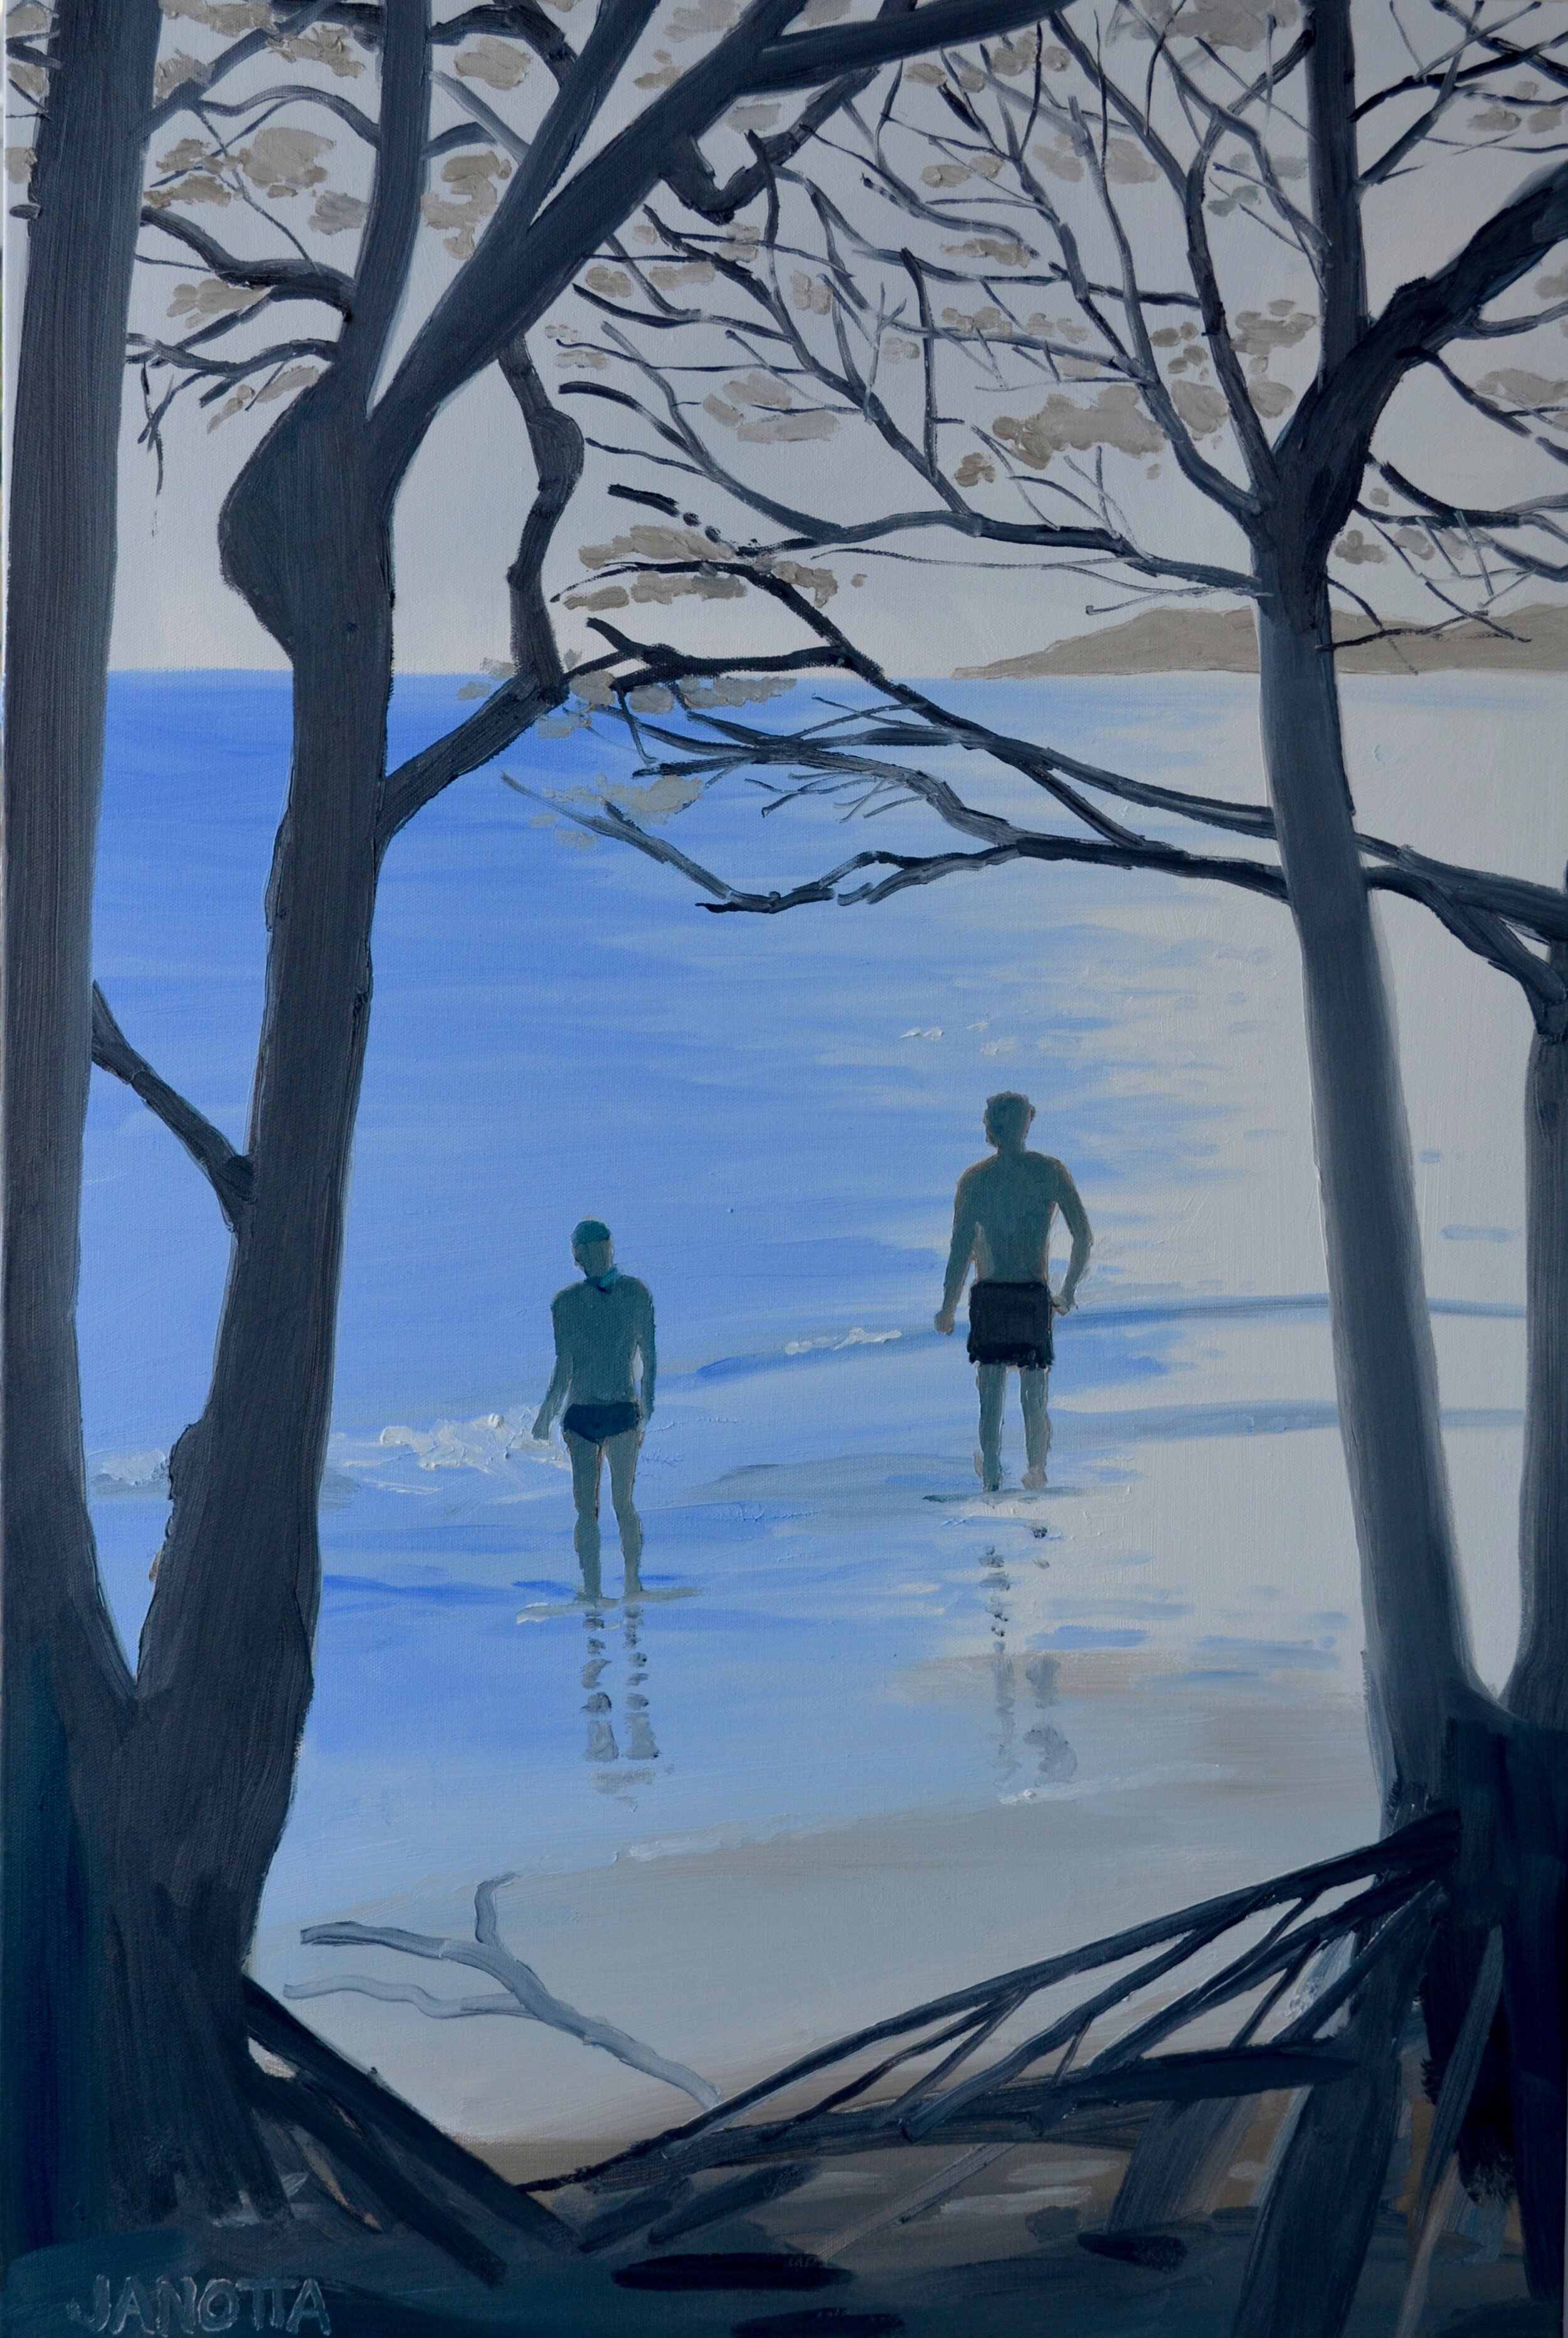 ROADSIDE BEACH 36x24 oil on canvas